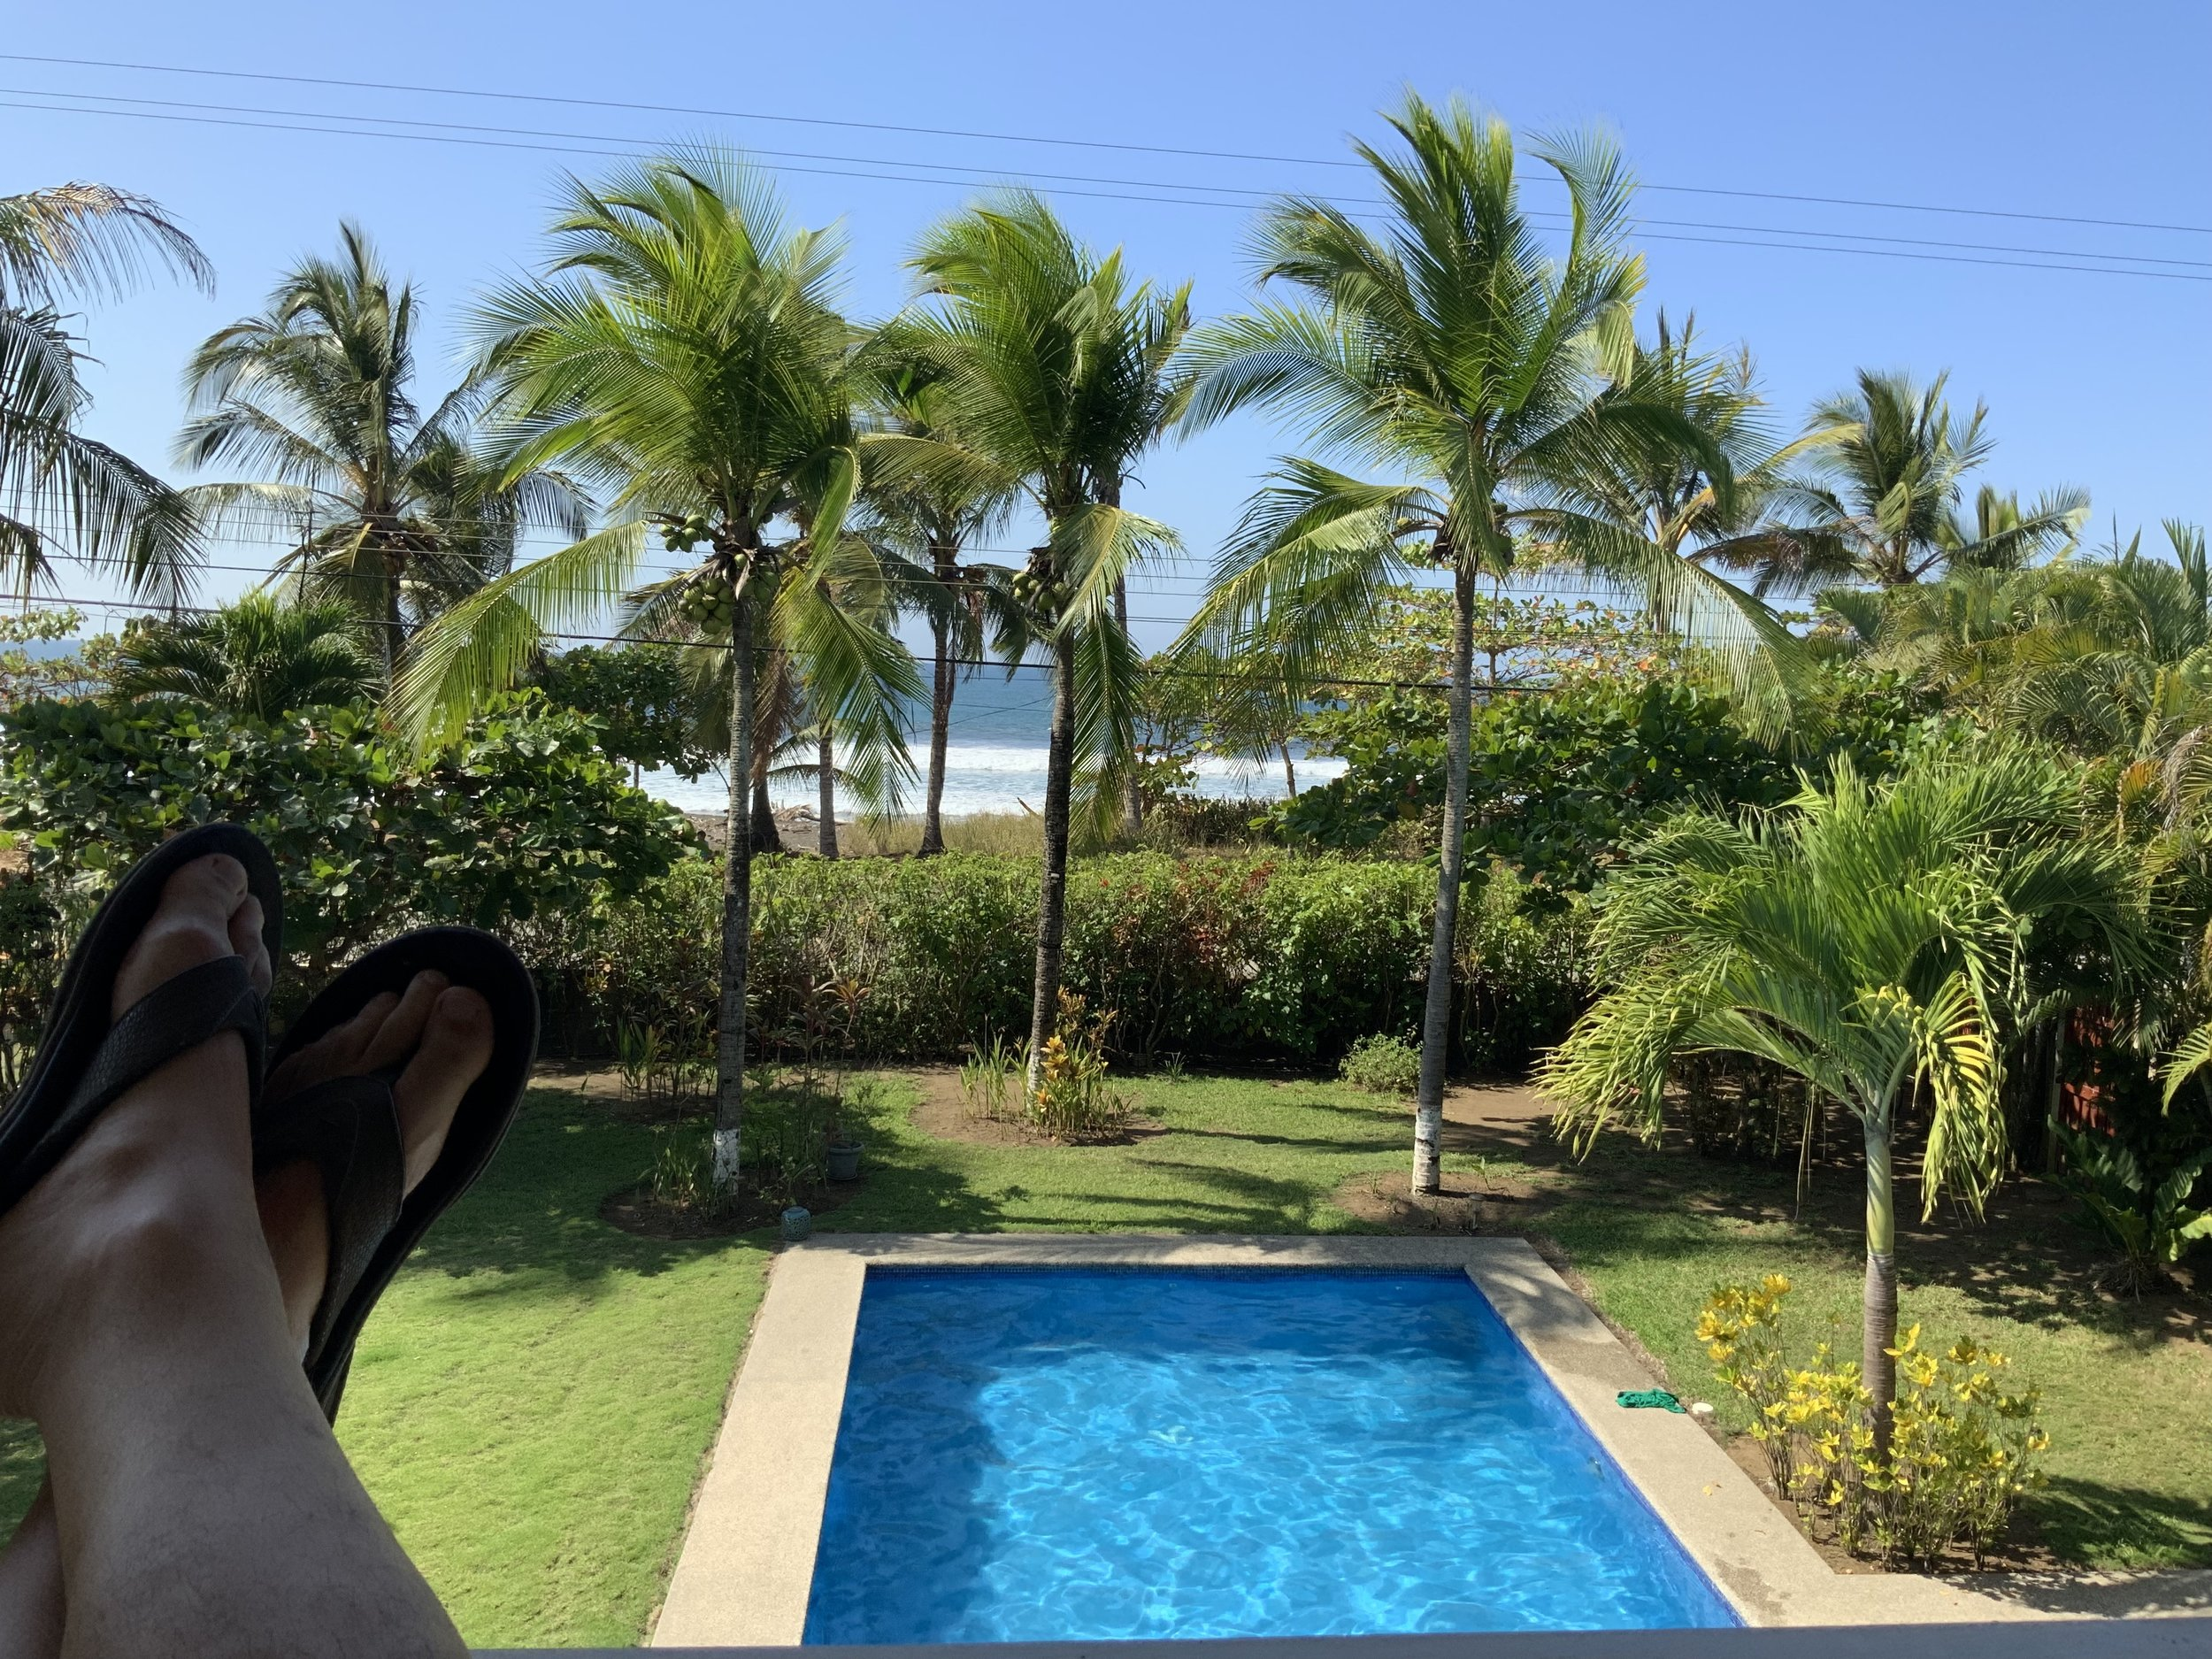 costarica-view-deck copy.jpg